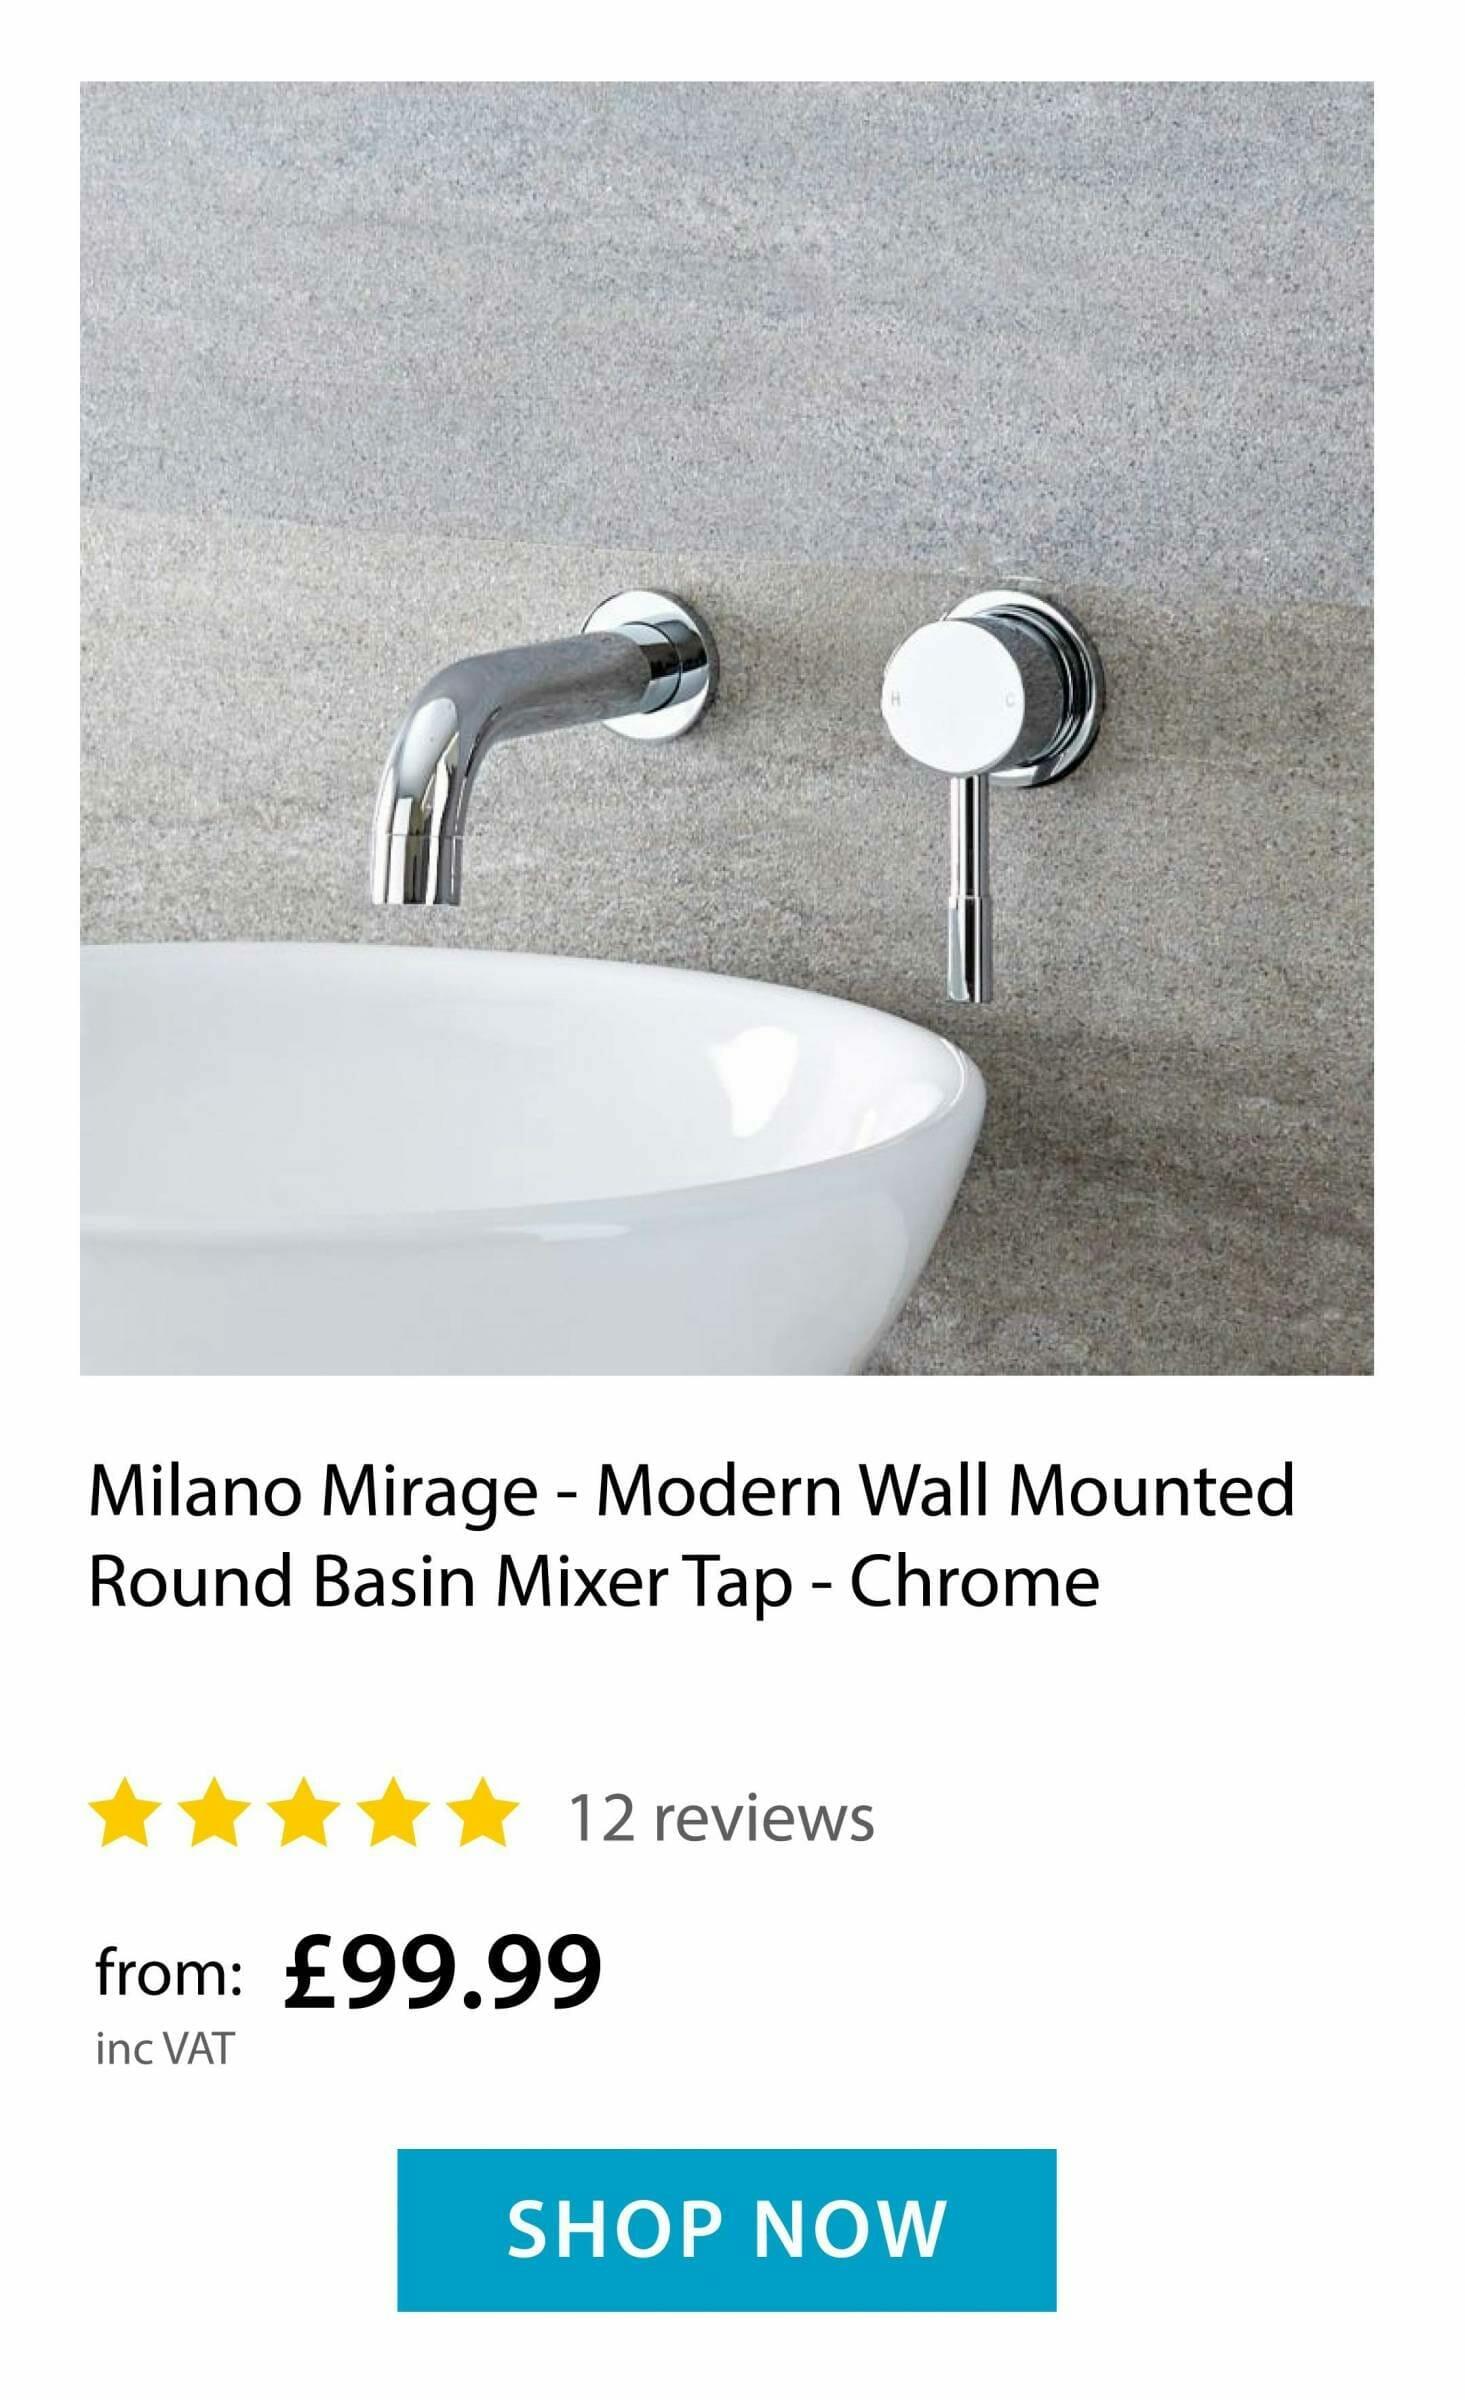 Milano Mirage - Wall Mounted Round Basin Mixer Tap